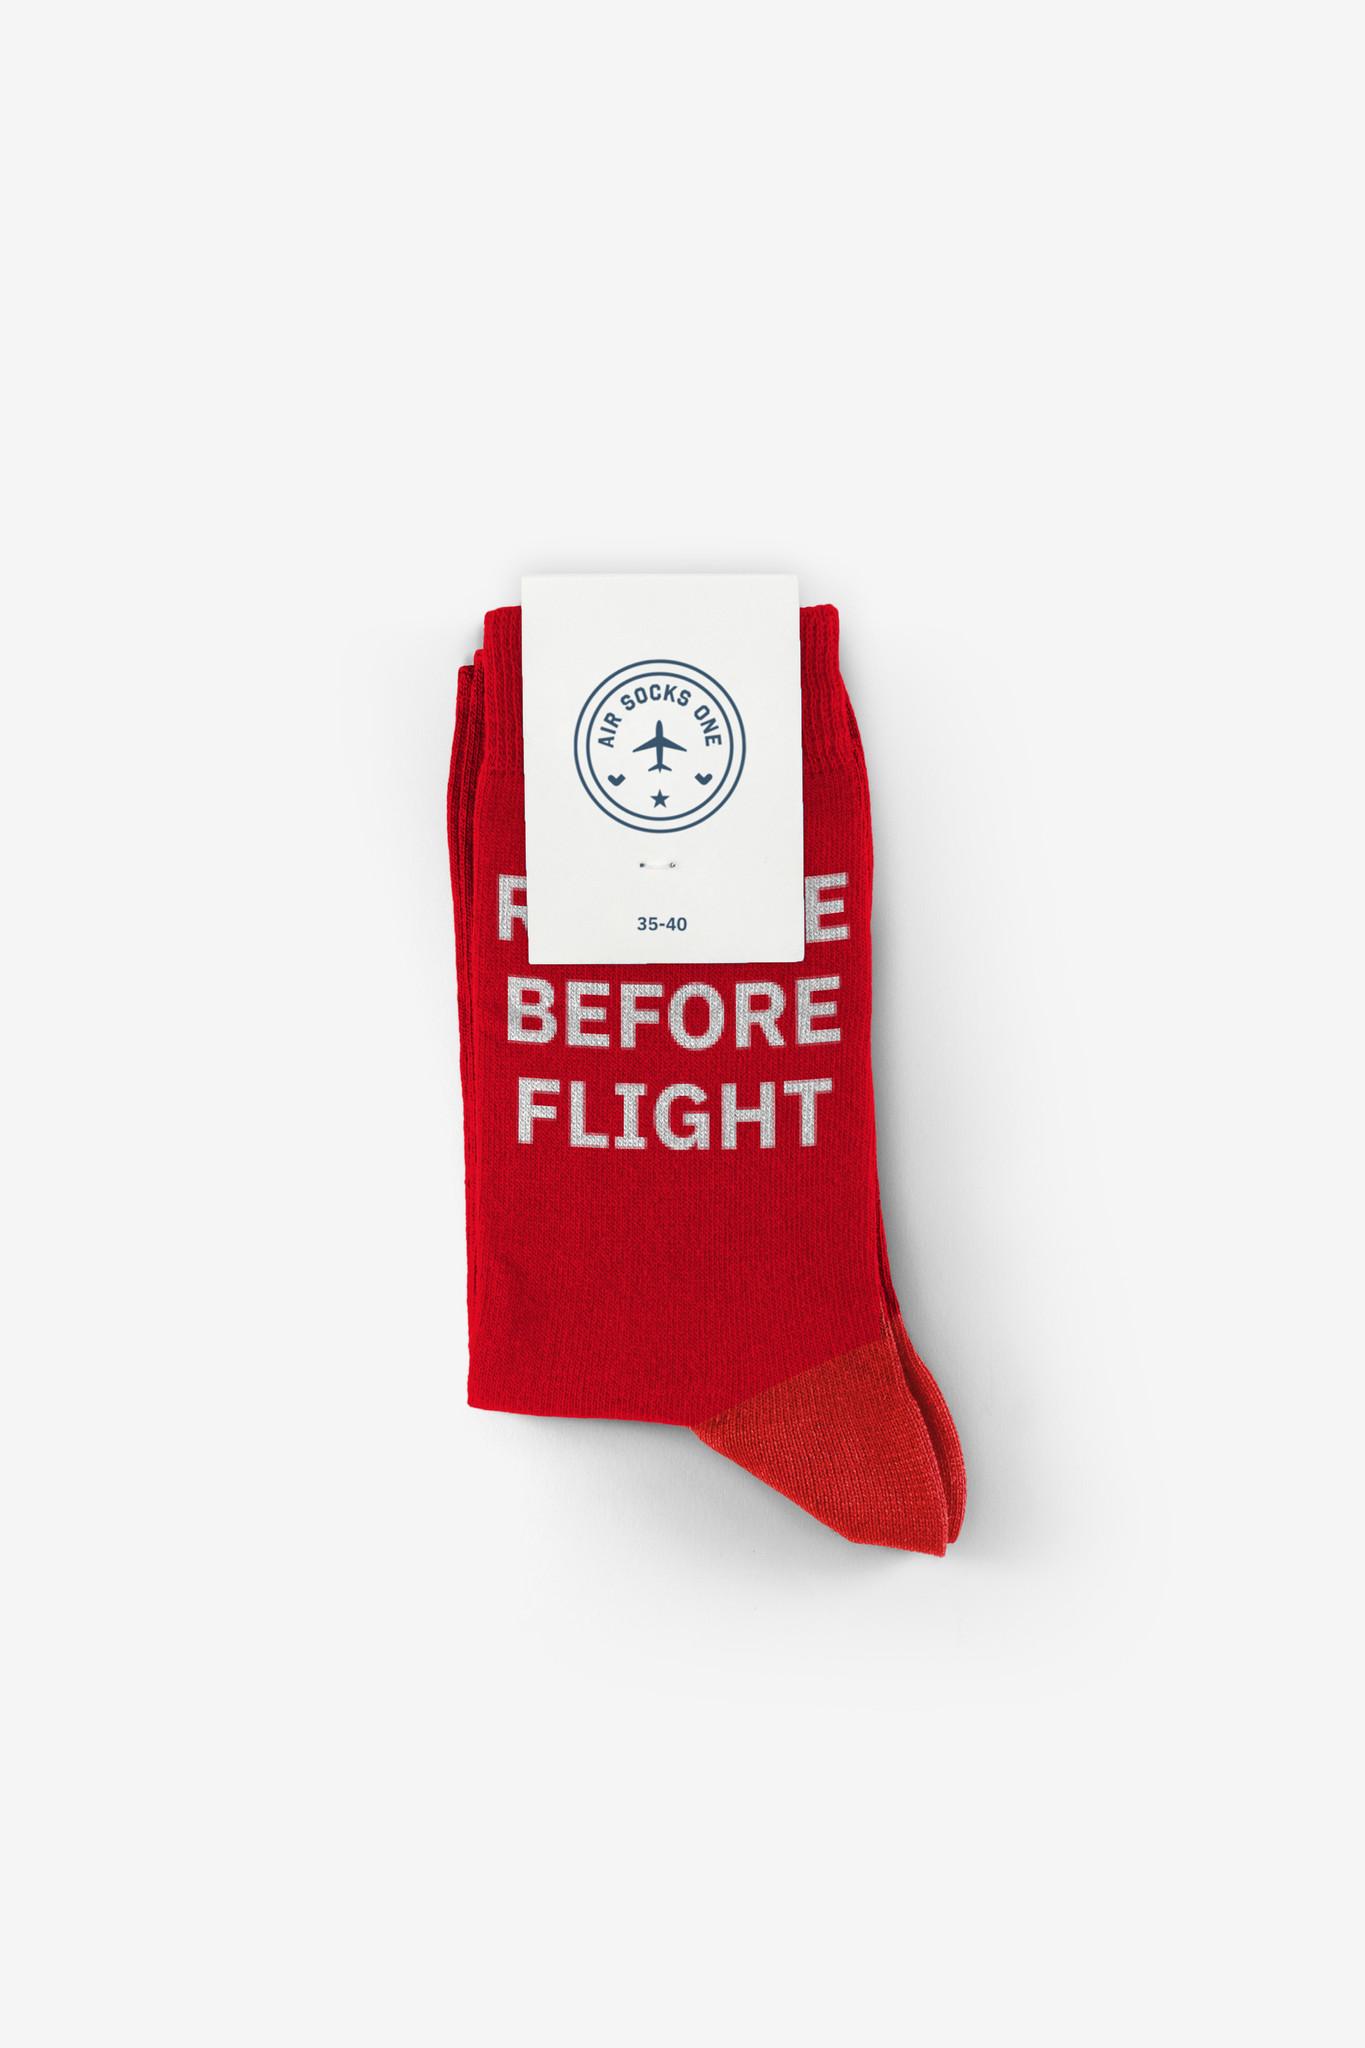 AirSocks Socken Remove before flight